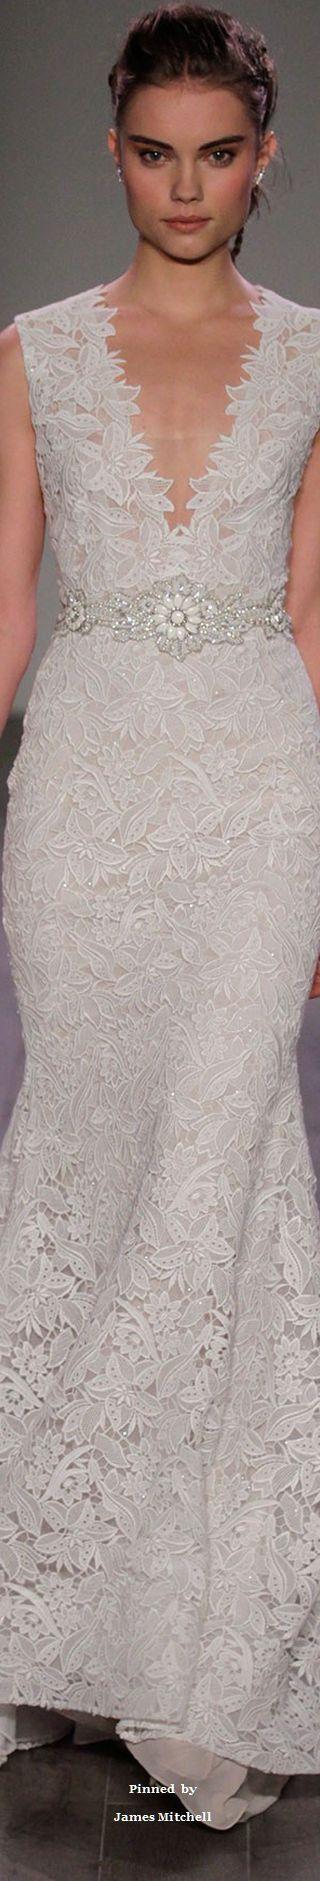 The 672 best Wedding dress ideas images on Pinterest | Wedding ...